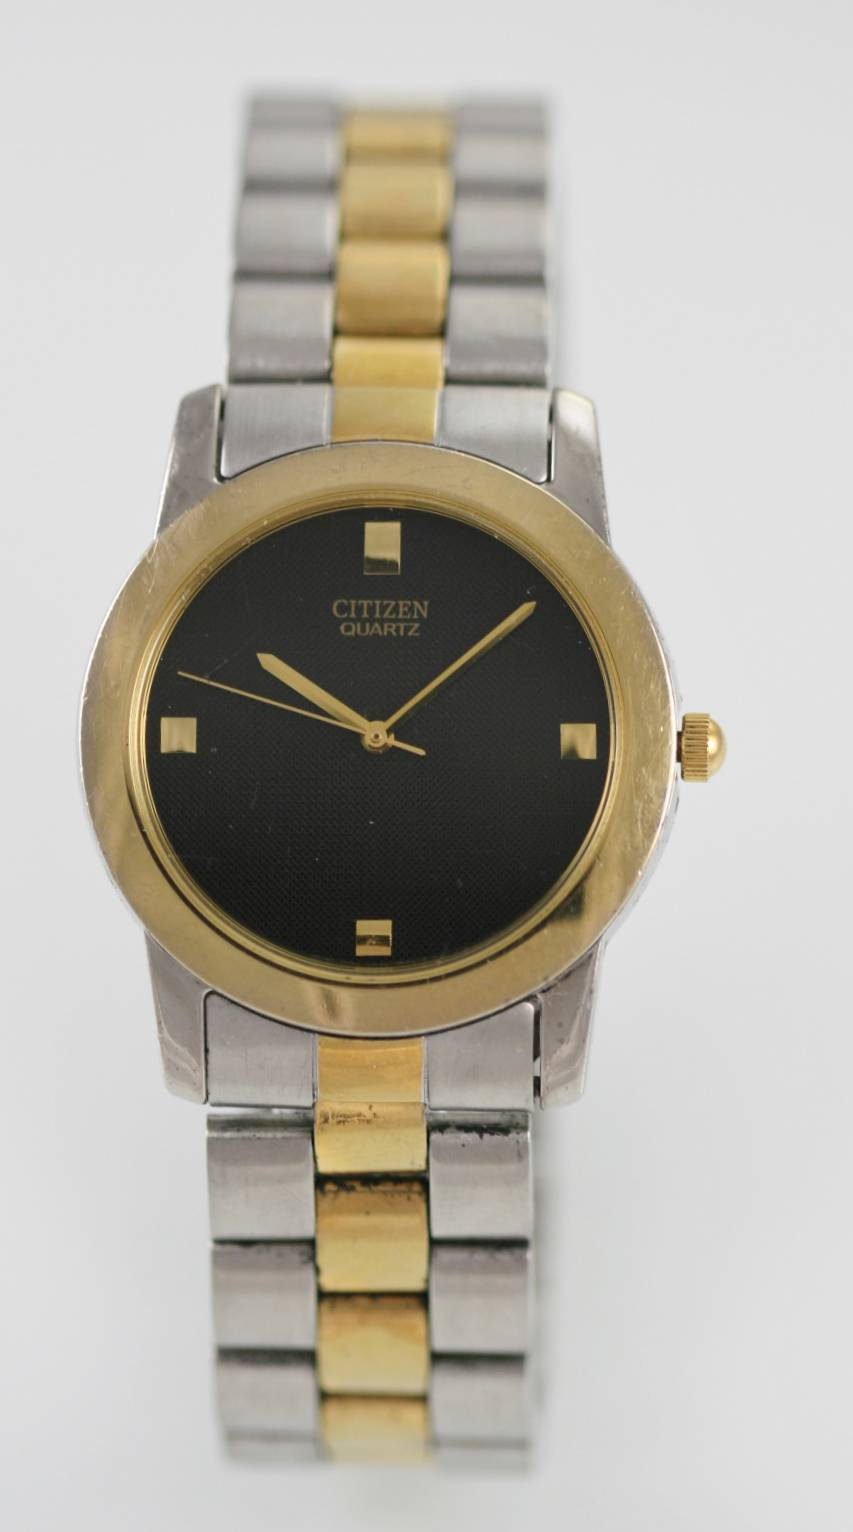 Detalles de Citizen Reloj Hombre Oro Plata Acero Inoxidable Resistente Al Agua Negro Batería